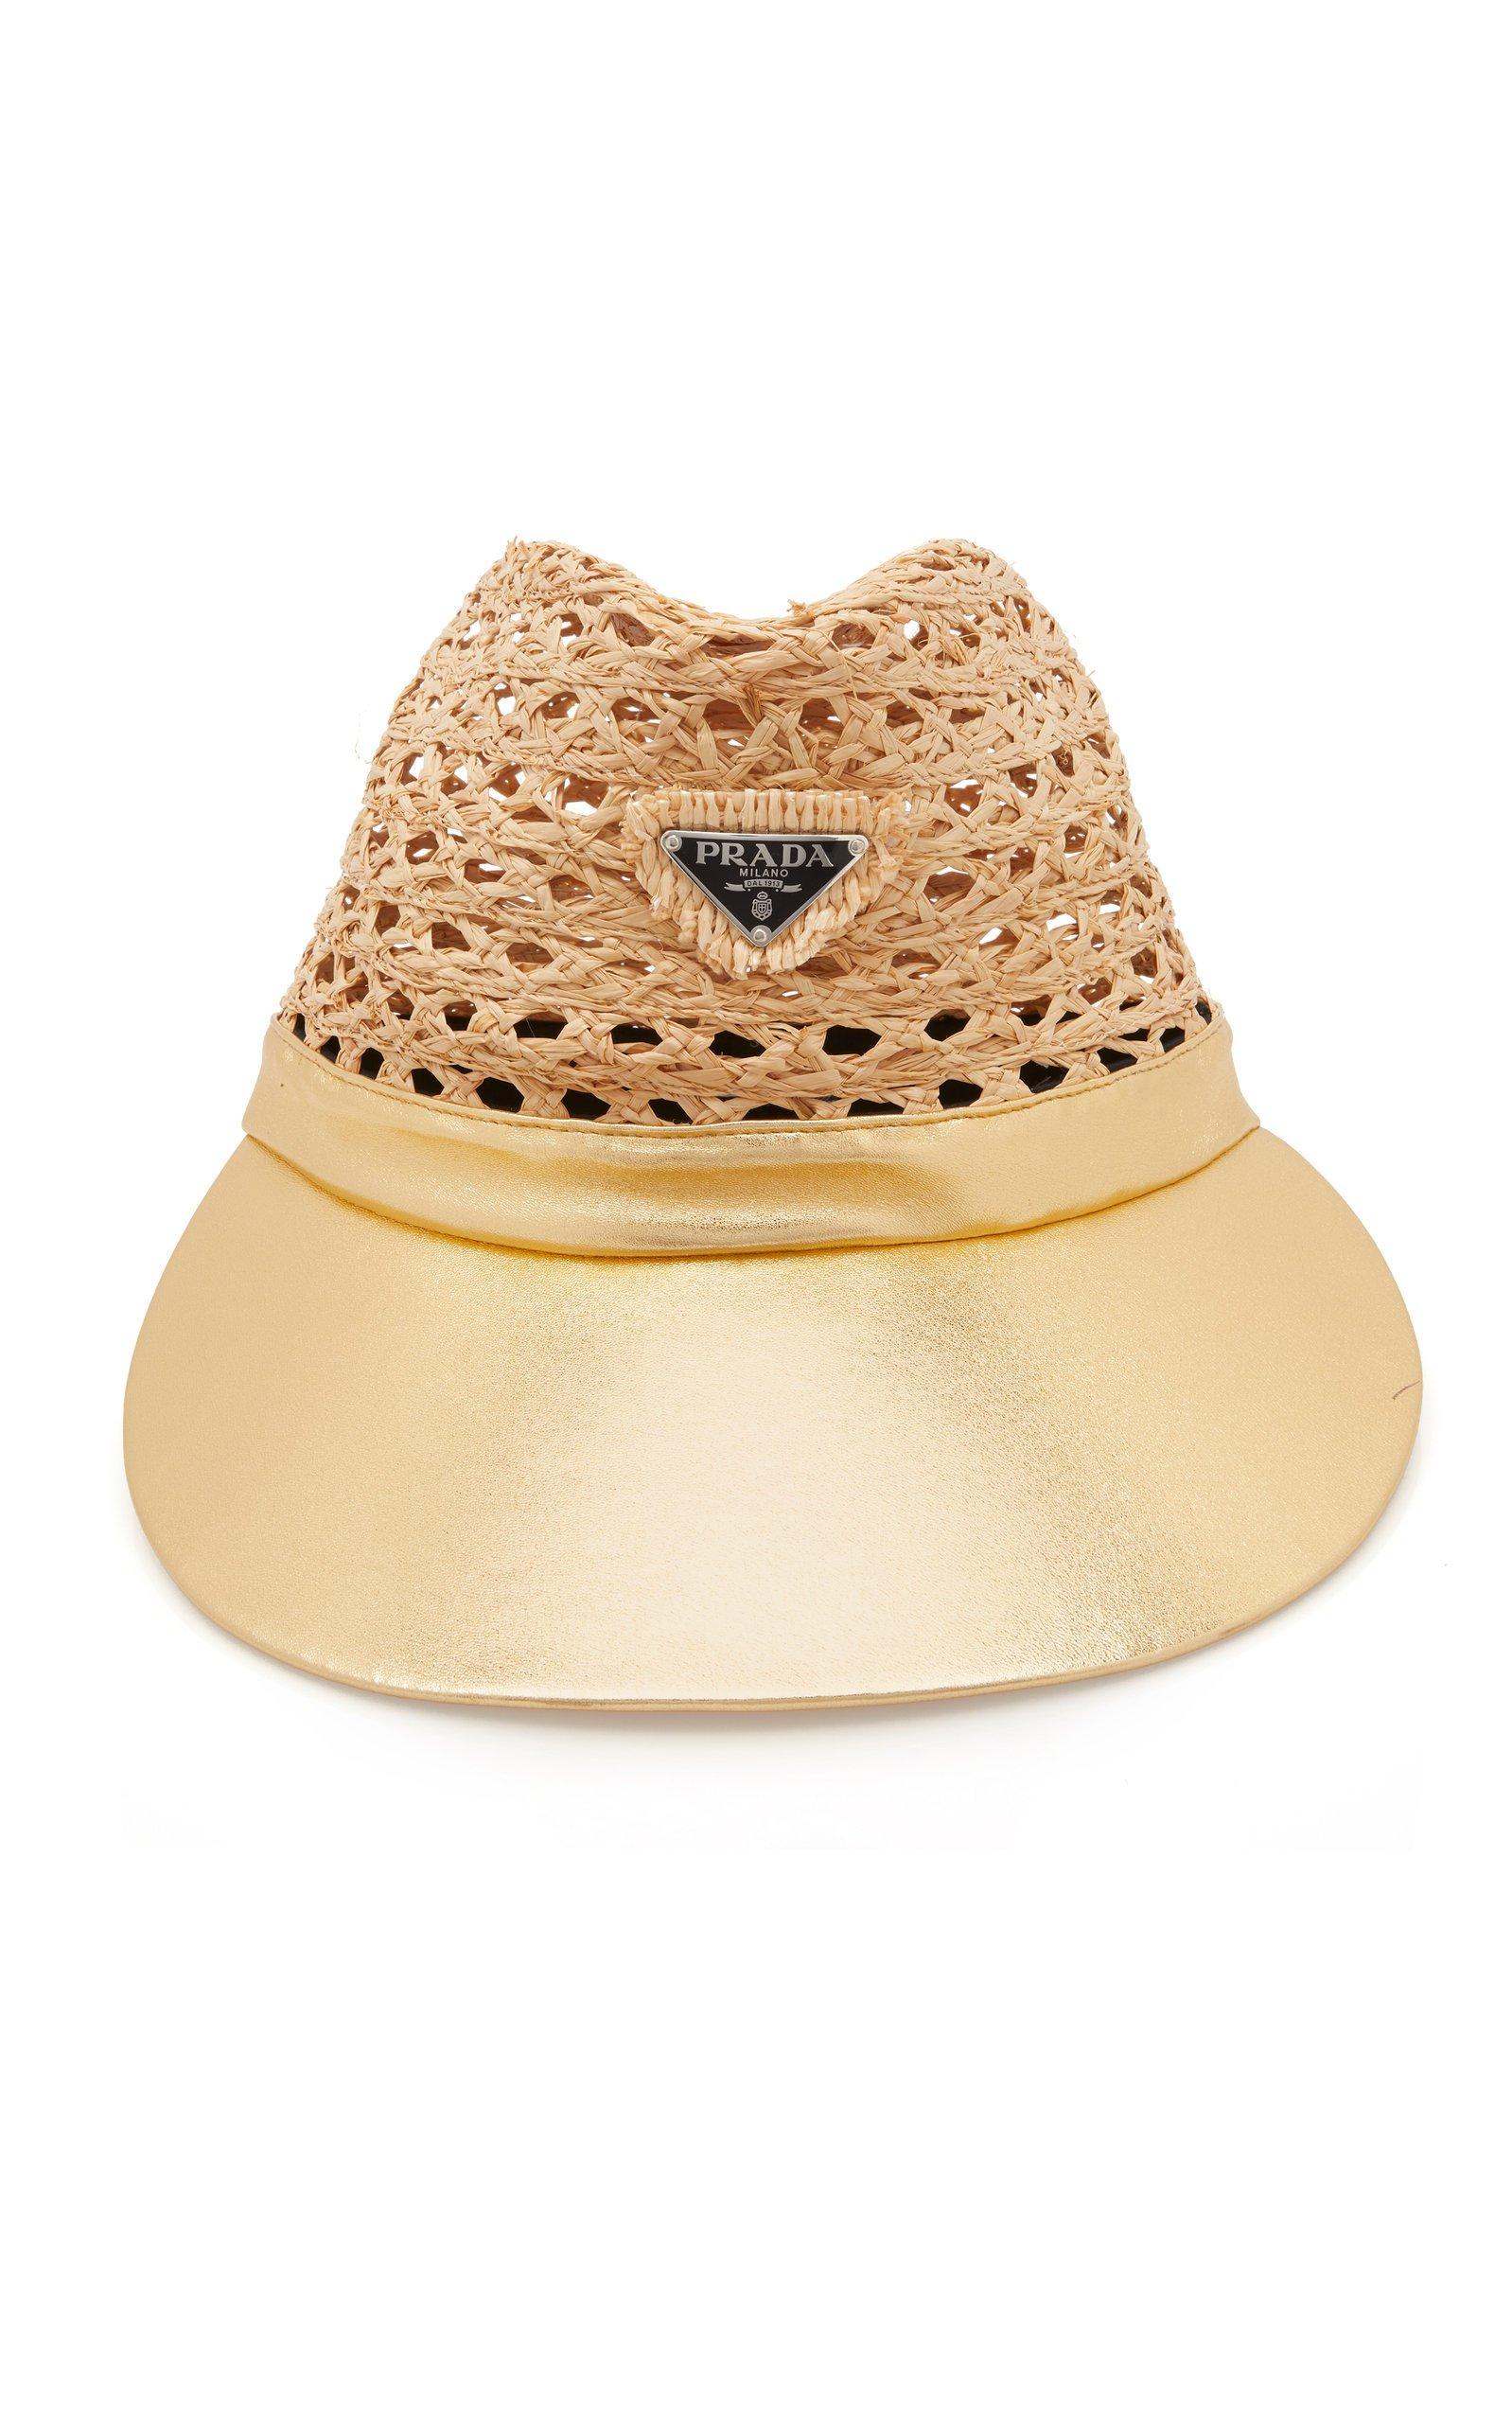 Prada Triangolo Raffia Hat Size: S